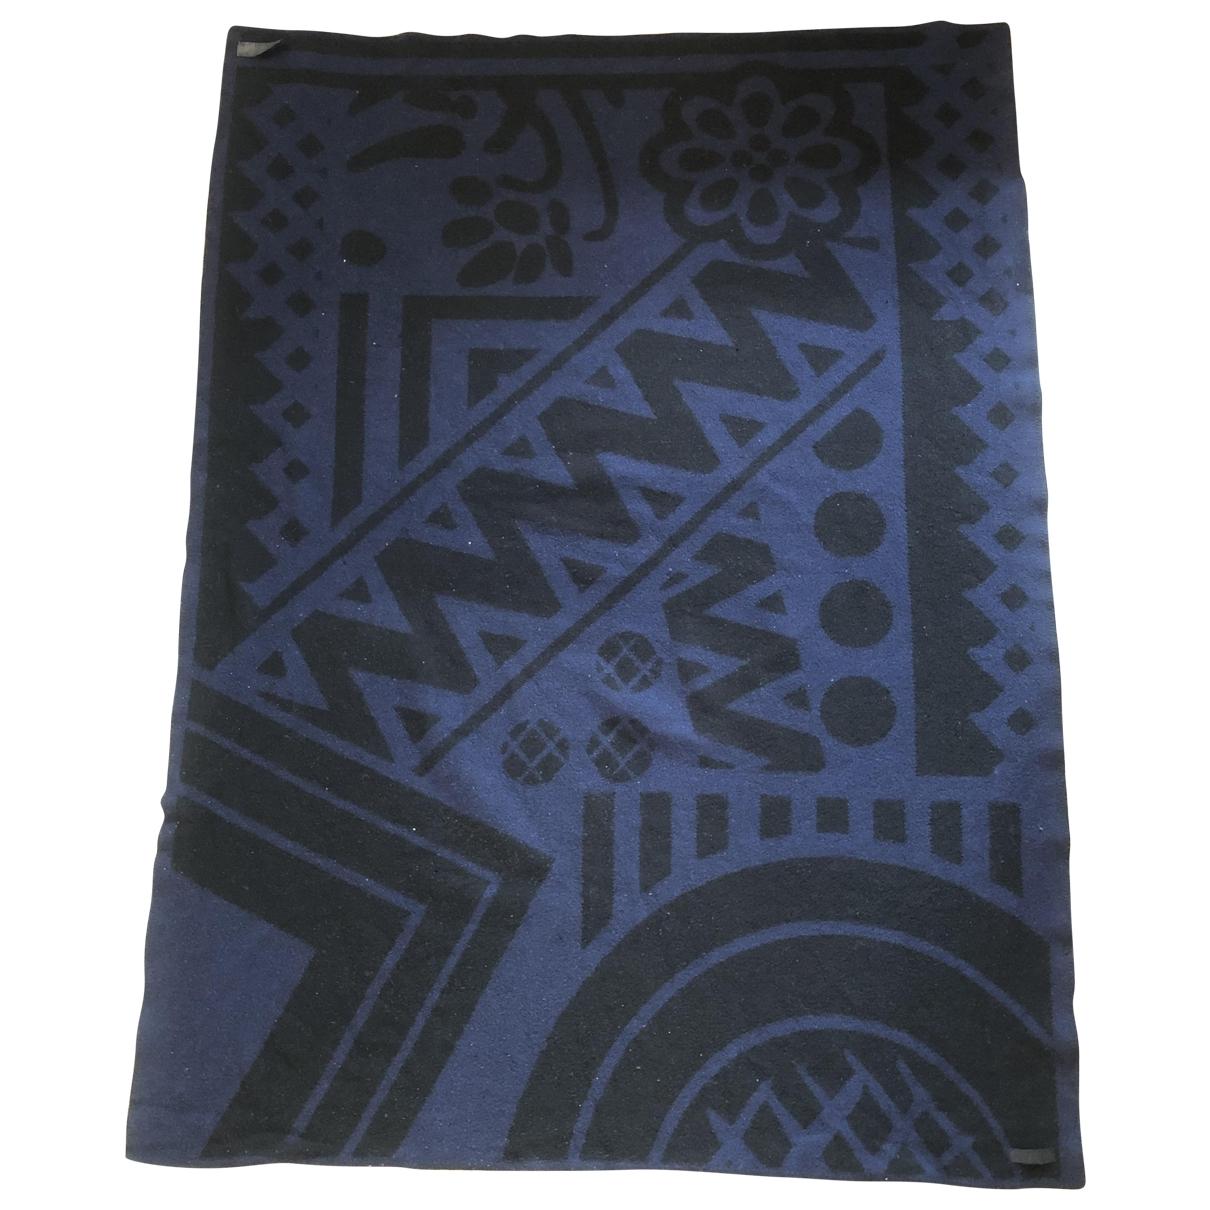 Textil de hogar de Cachemira Burberry